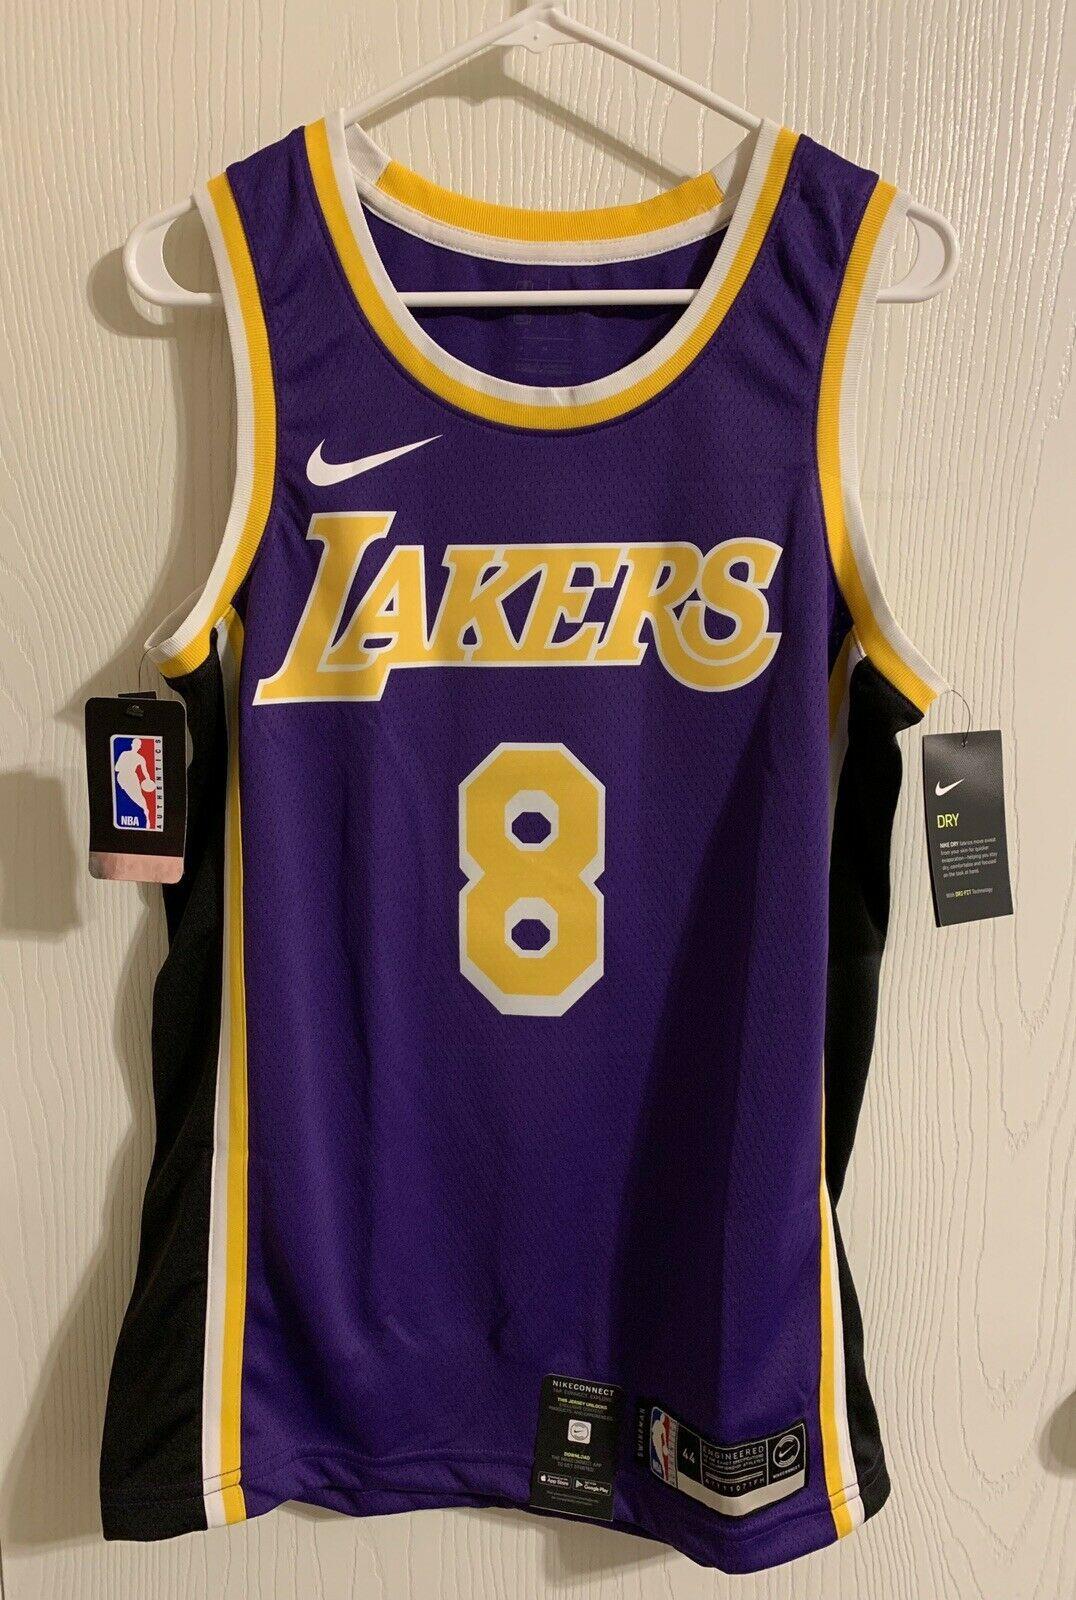 Nike La Lakers Kobe Bryant 8 Swingman Statement Jersey Av3701 504 Brand New In 2020 Nike Kobe Bryant Kobe Bryant 8 Kobe Bryant